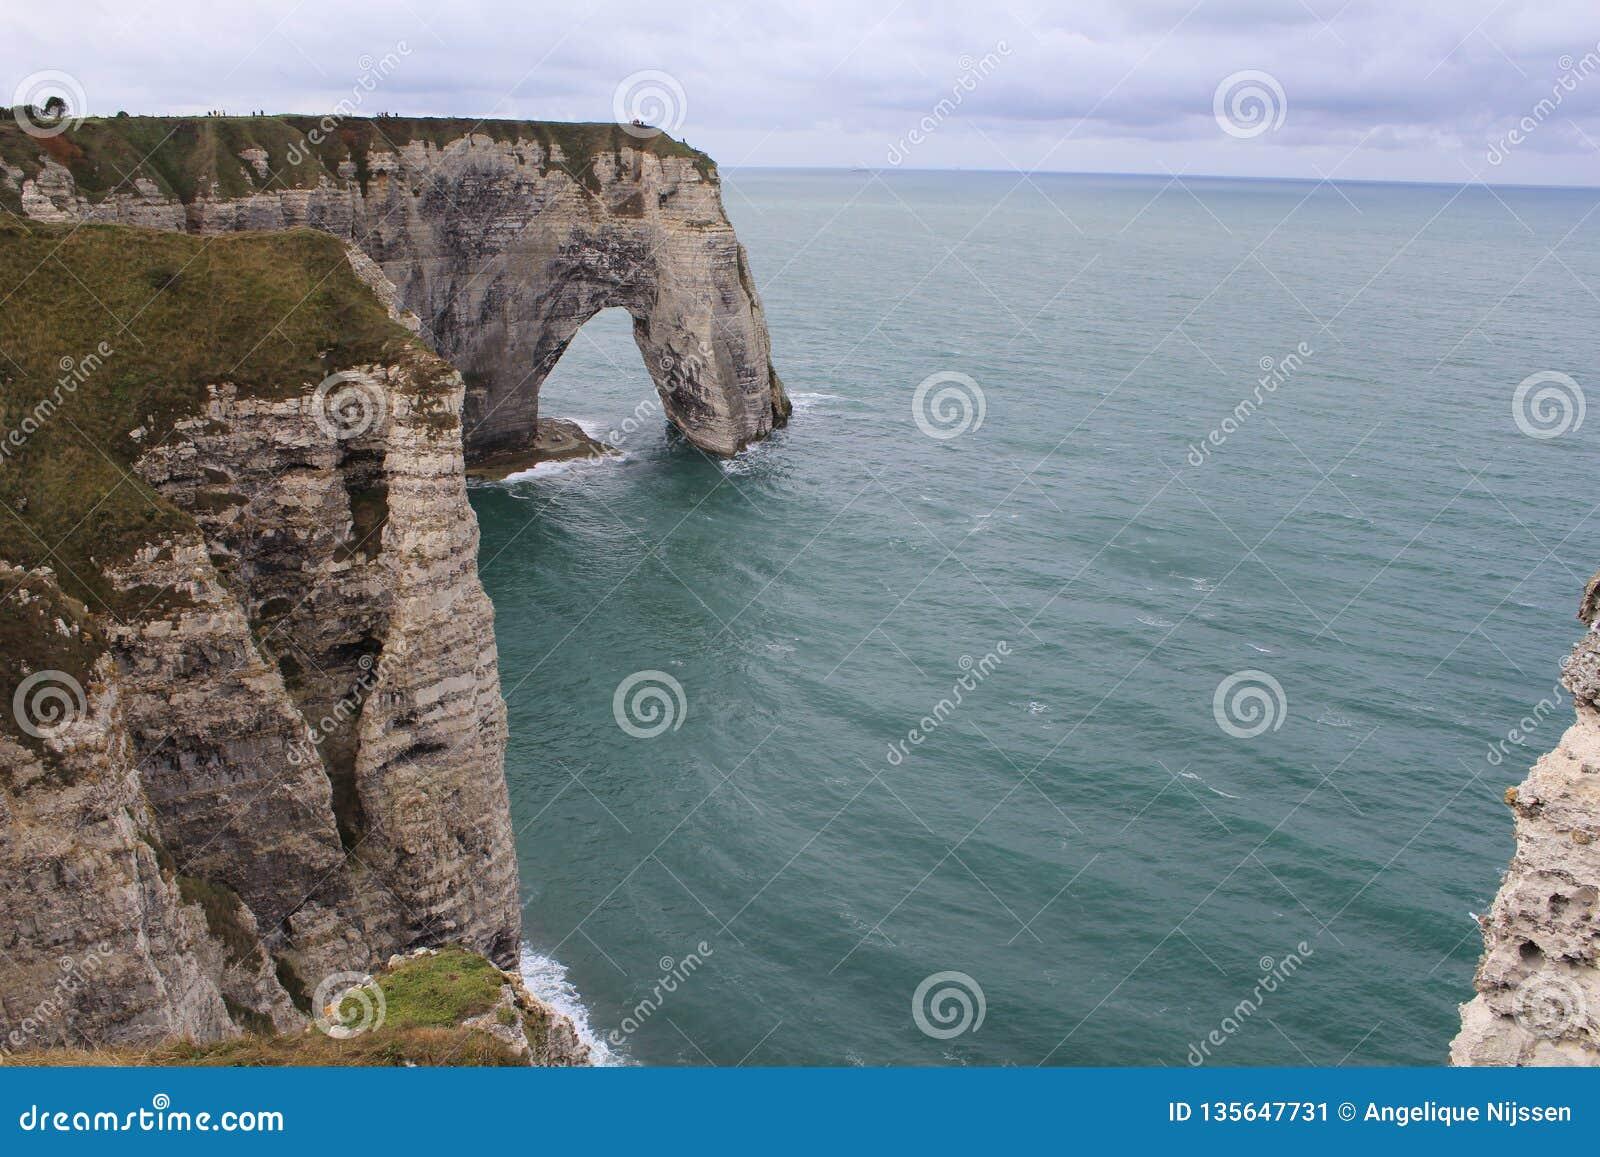 Boog in de witte albasten klippenkust in normady, Frankrijk in de zomer